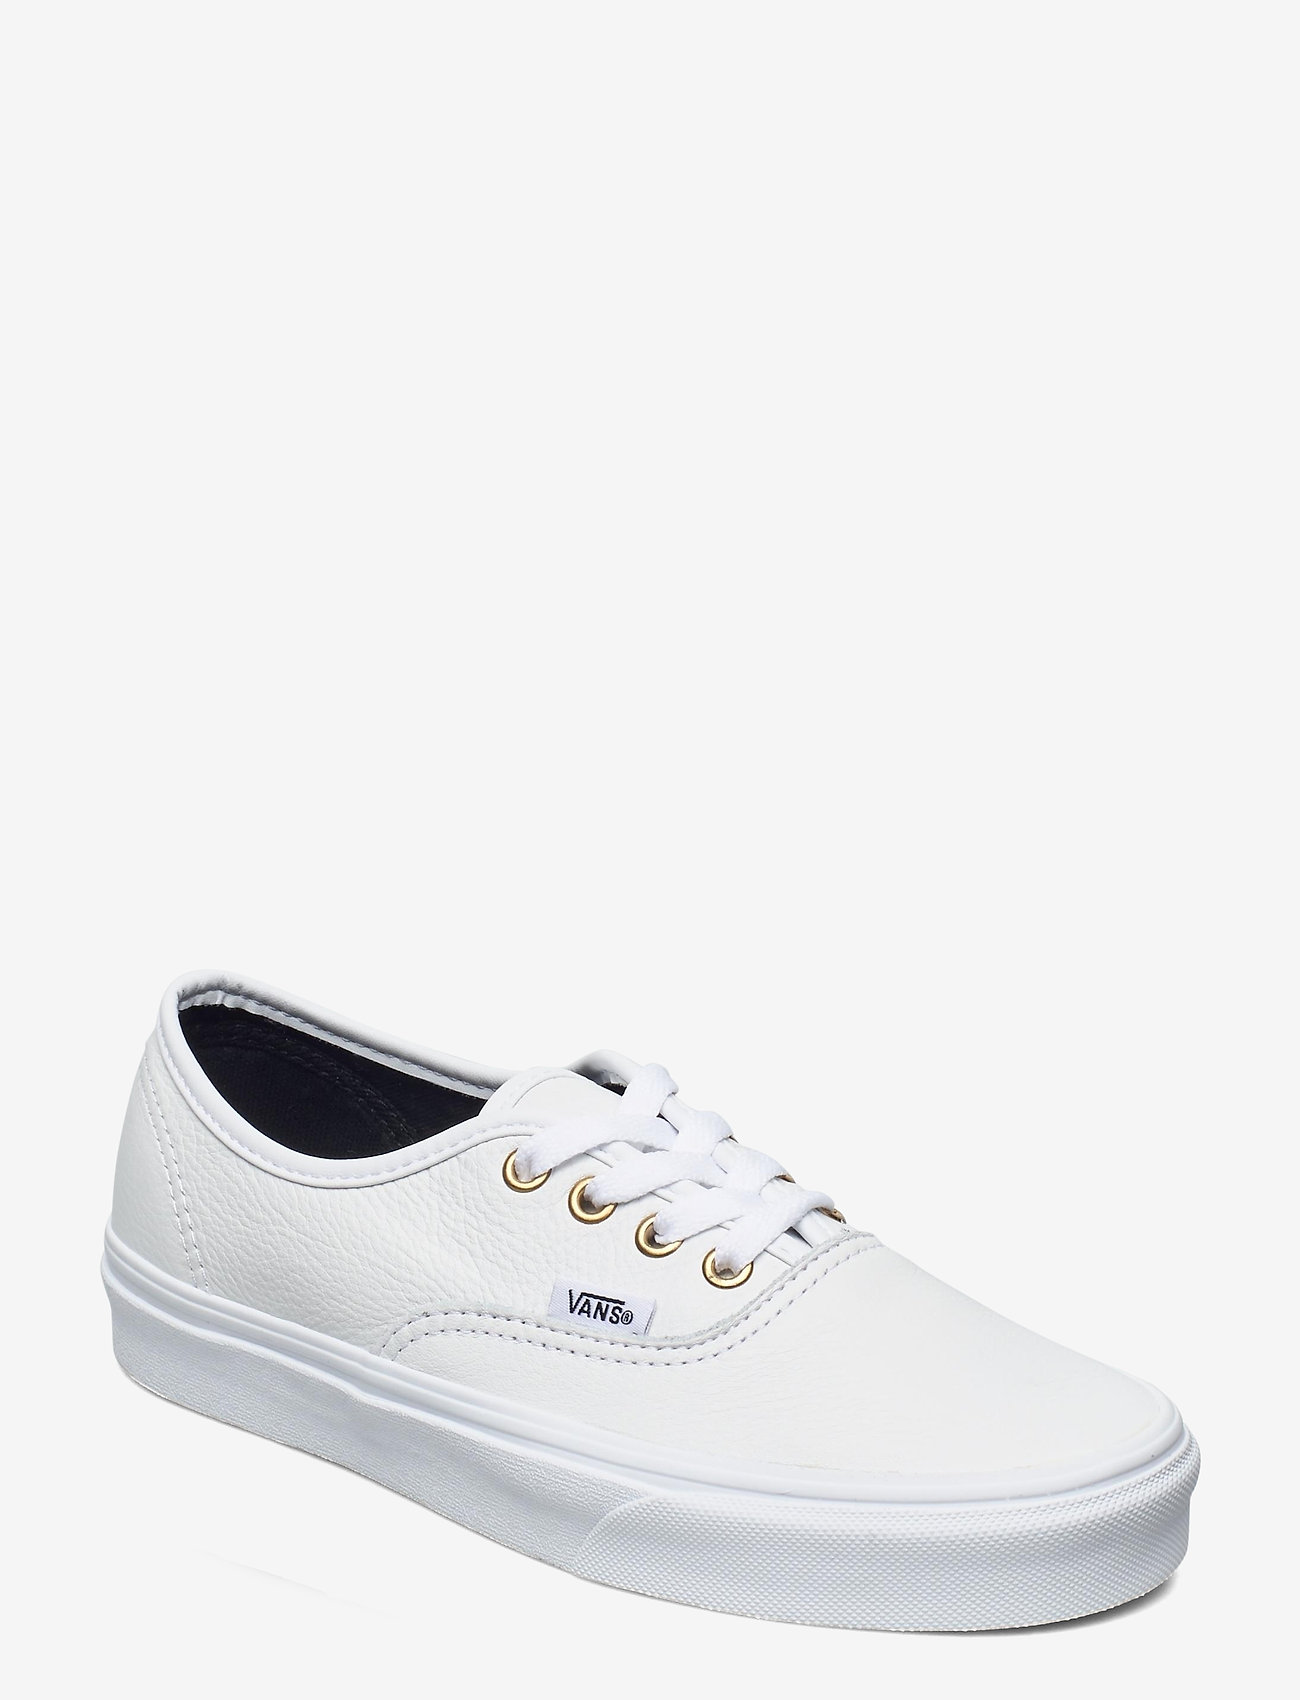 VANS - UA Authentic - laag sneakers - (leather) truewht/truewht - 0